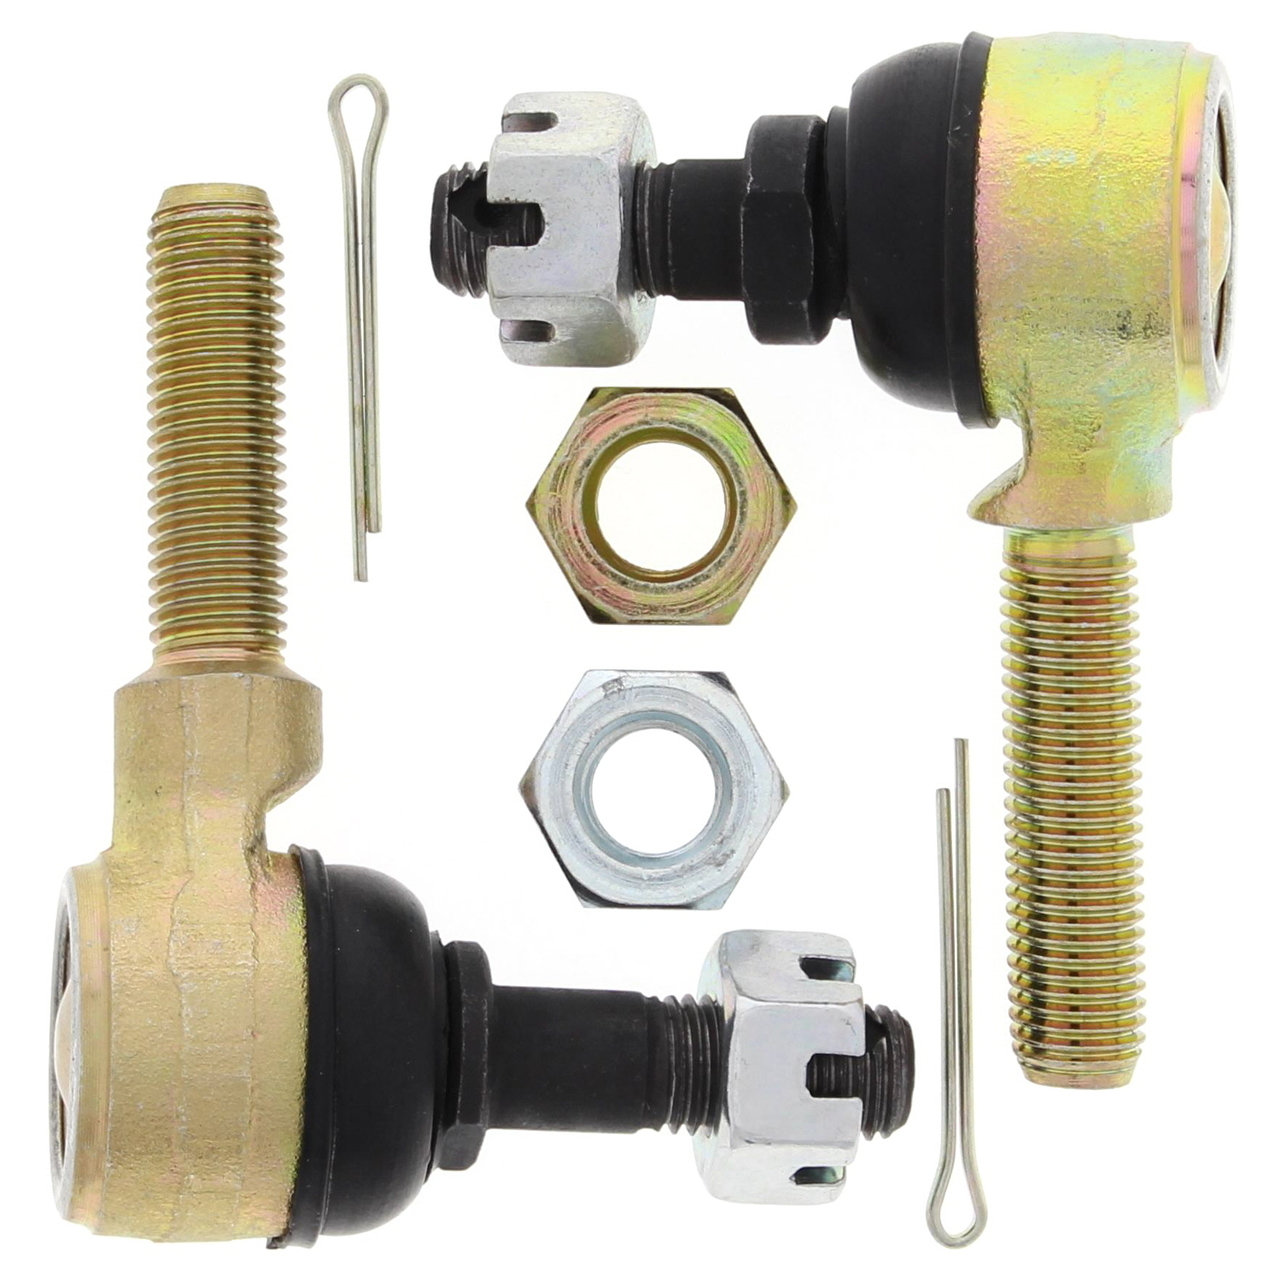 new tie rod end kit arctic cat 450 trv 450cc 2012 18369 0 - Denparts